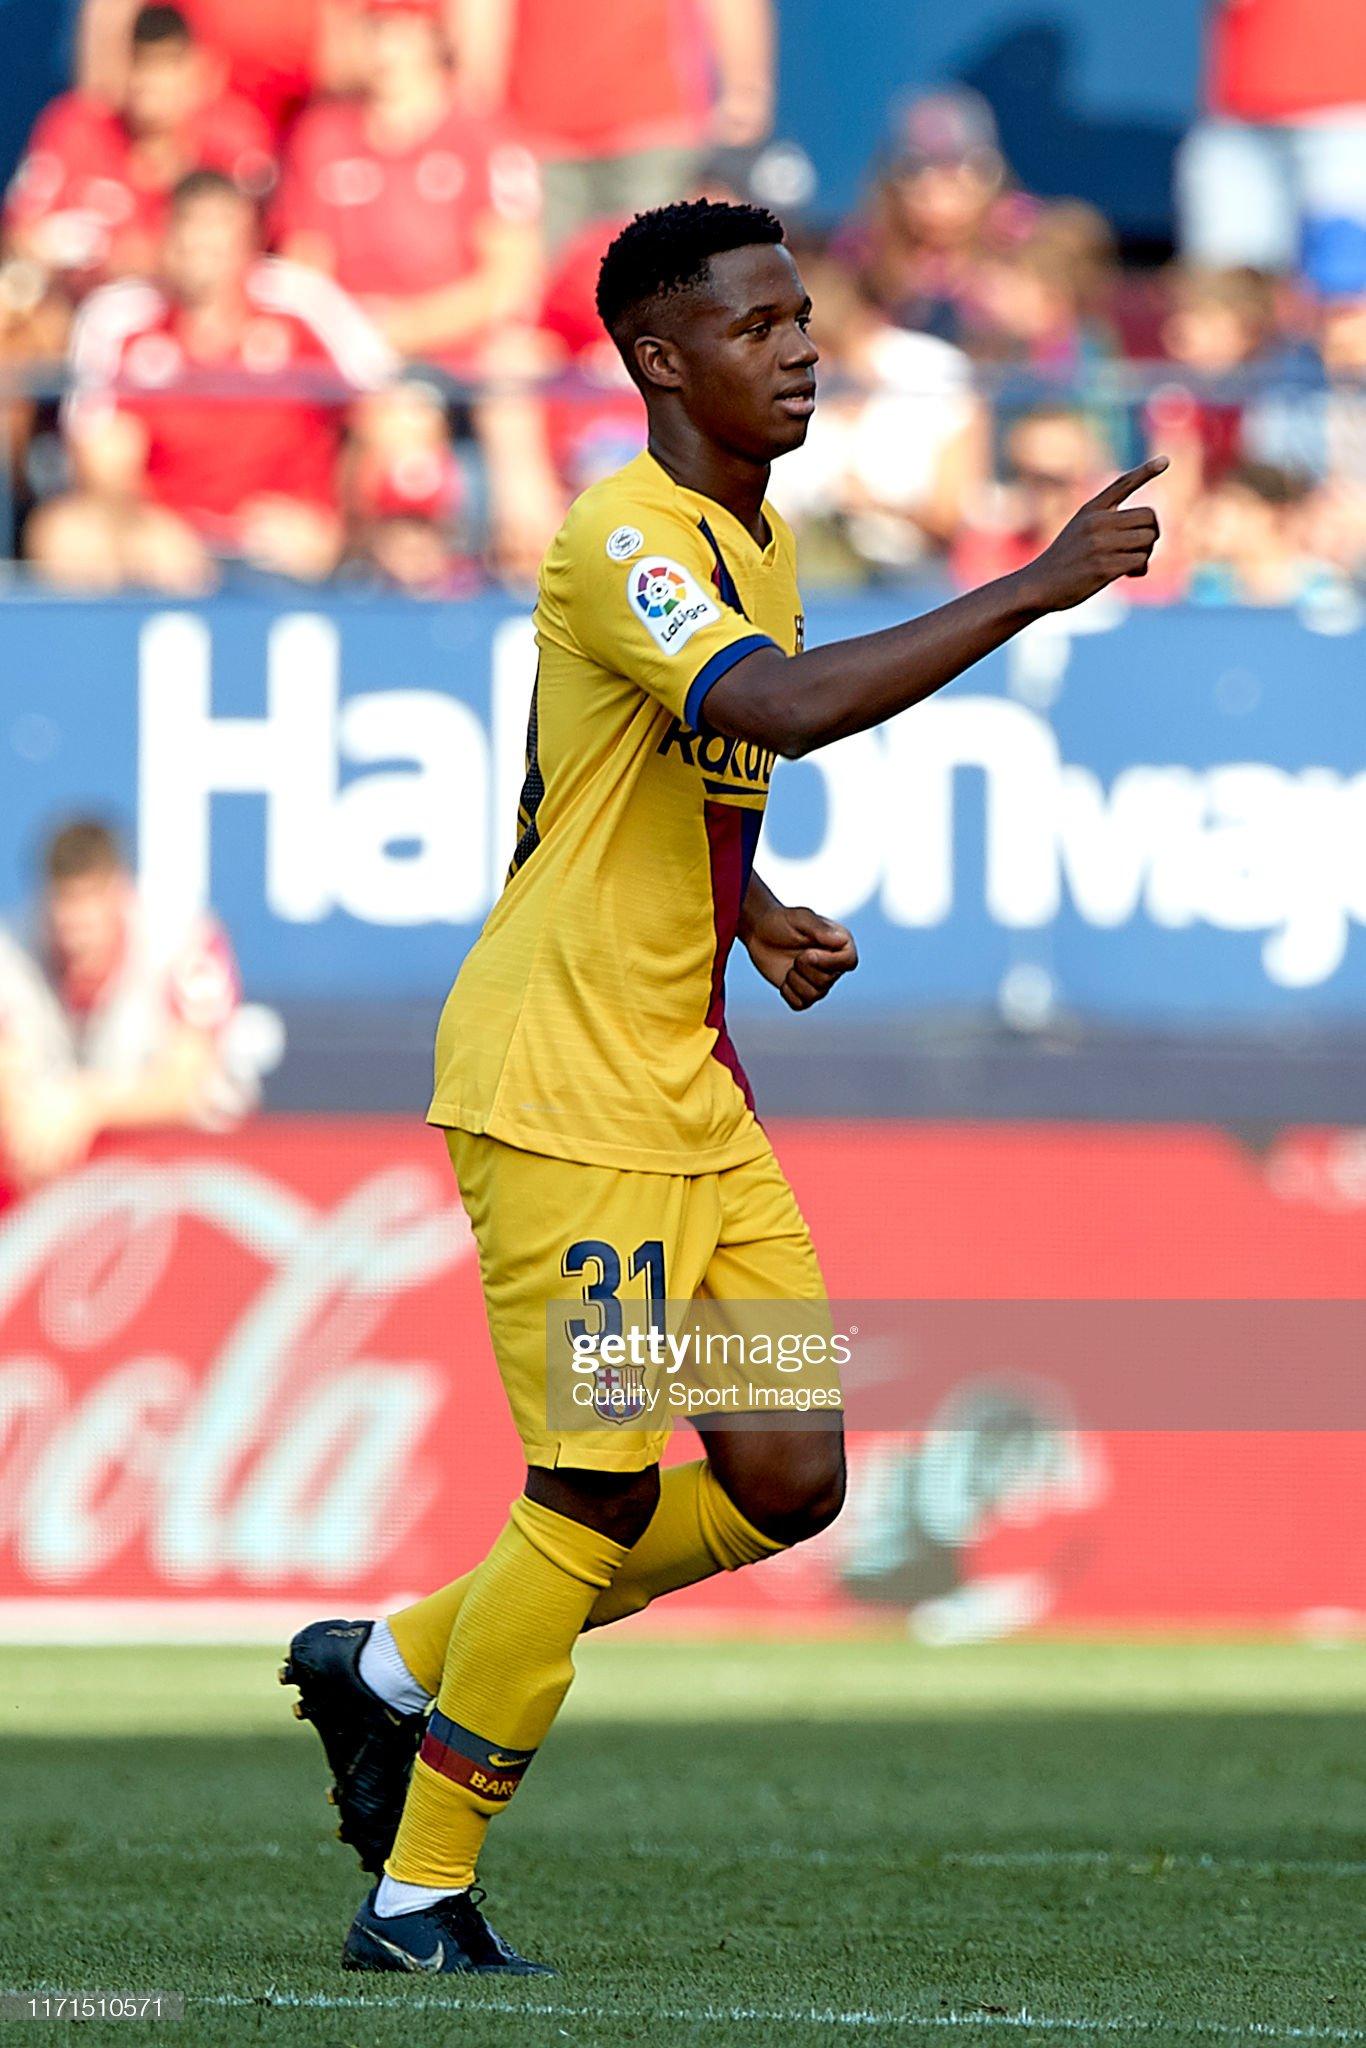 صور مباراة : أوساسونا - برشلونة 2-2 ( 31-08-2019 )  Ansu-fati-of-fc-barcelona-celebrates-his-goal-during-the-liga-match-picture-id1171510571?s=2048x2048